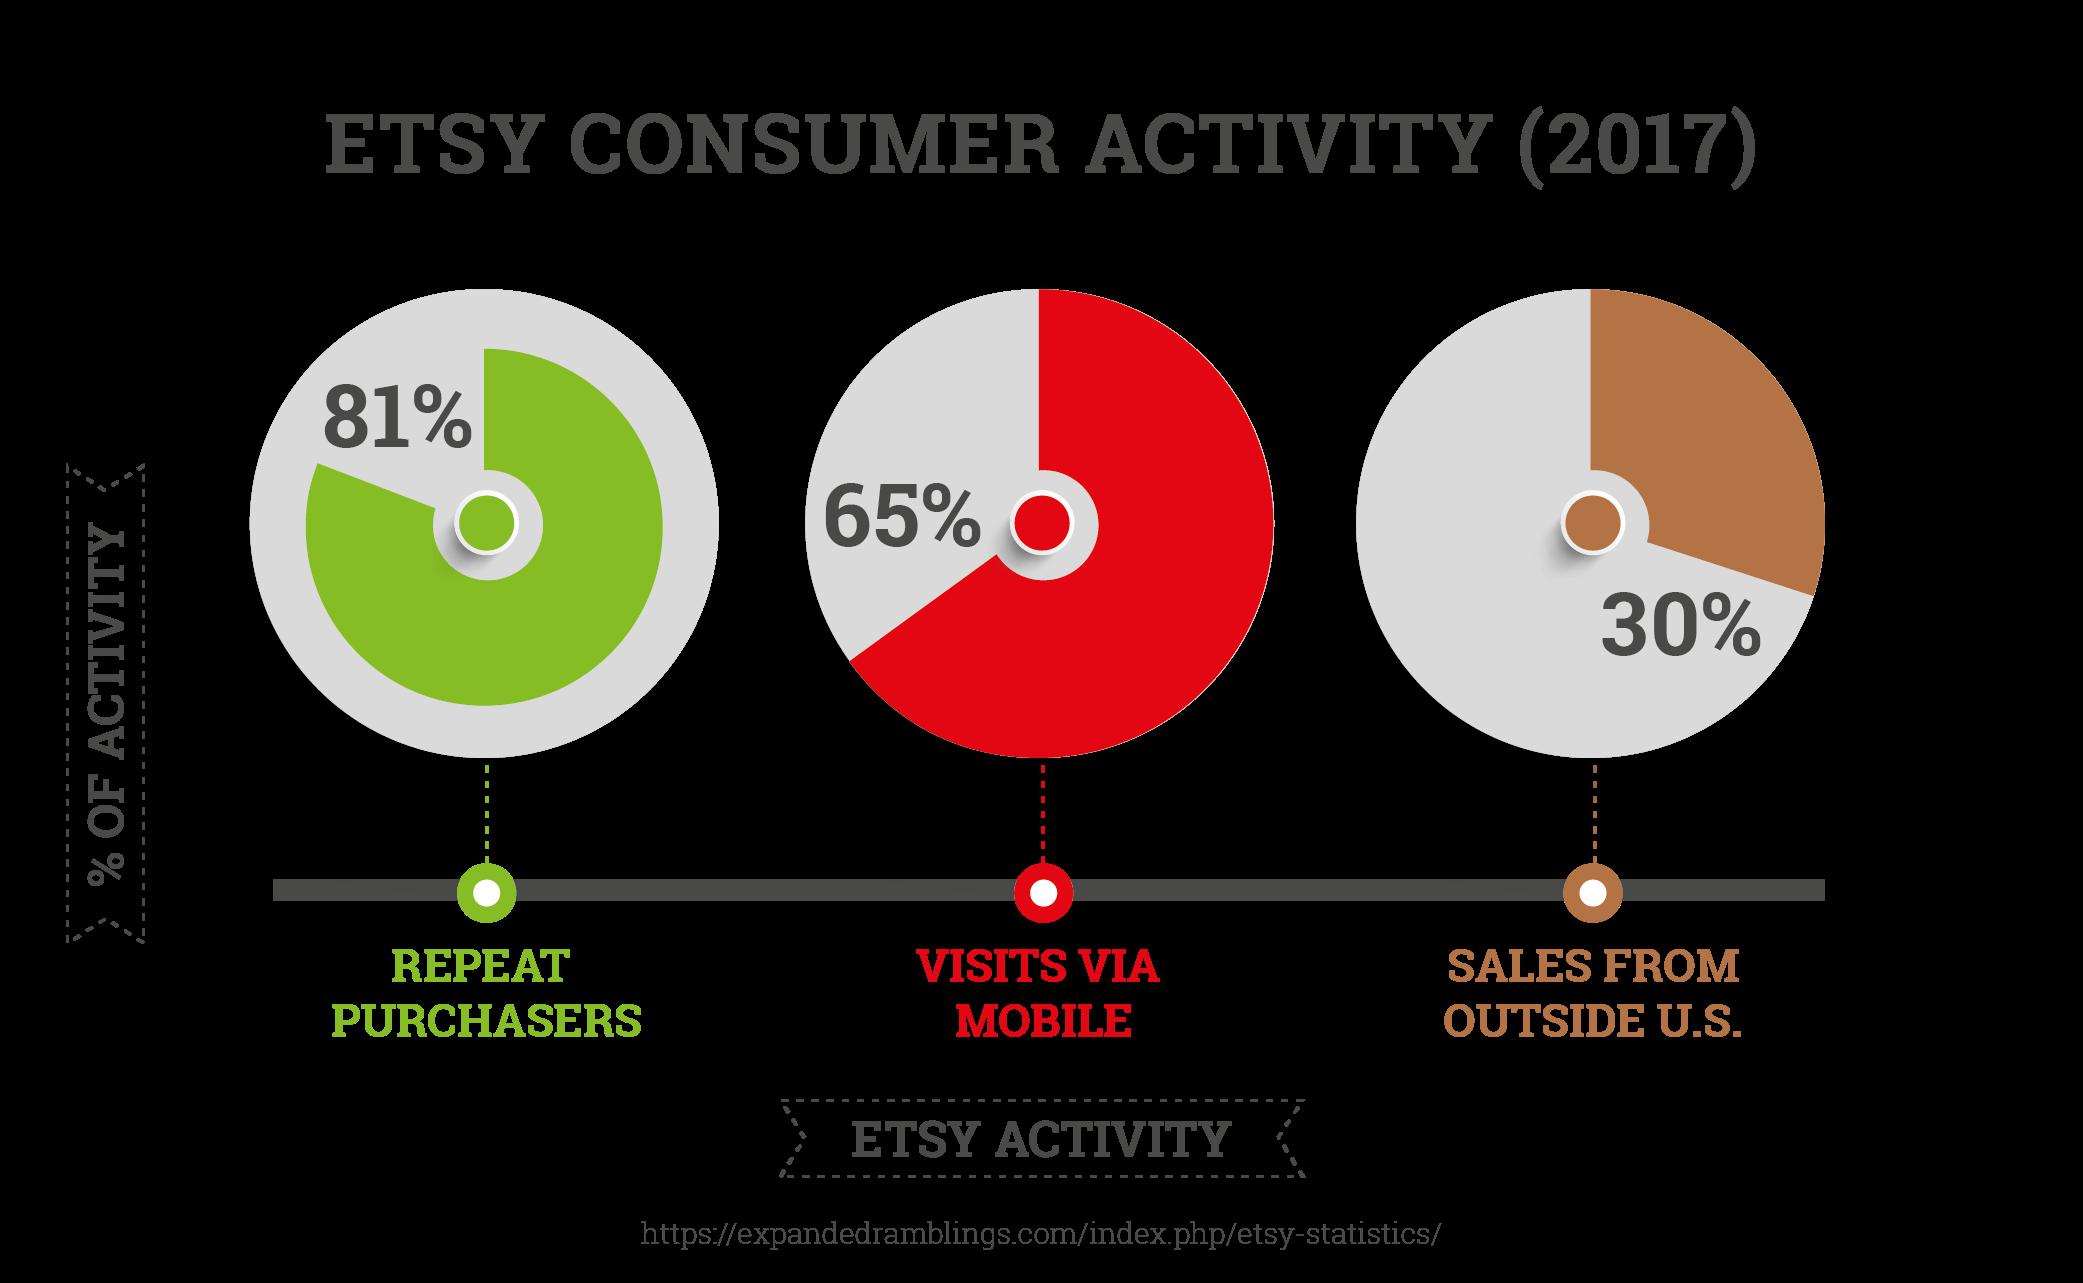 Etsy Consumer Activity (2017)